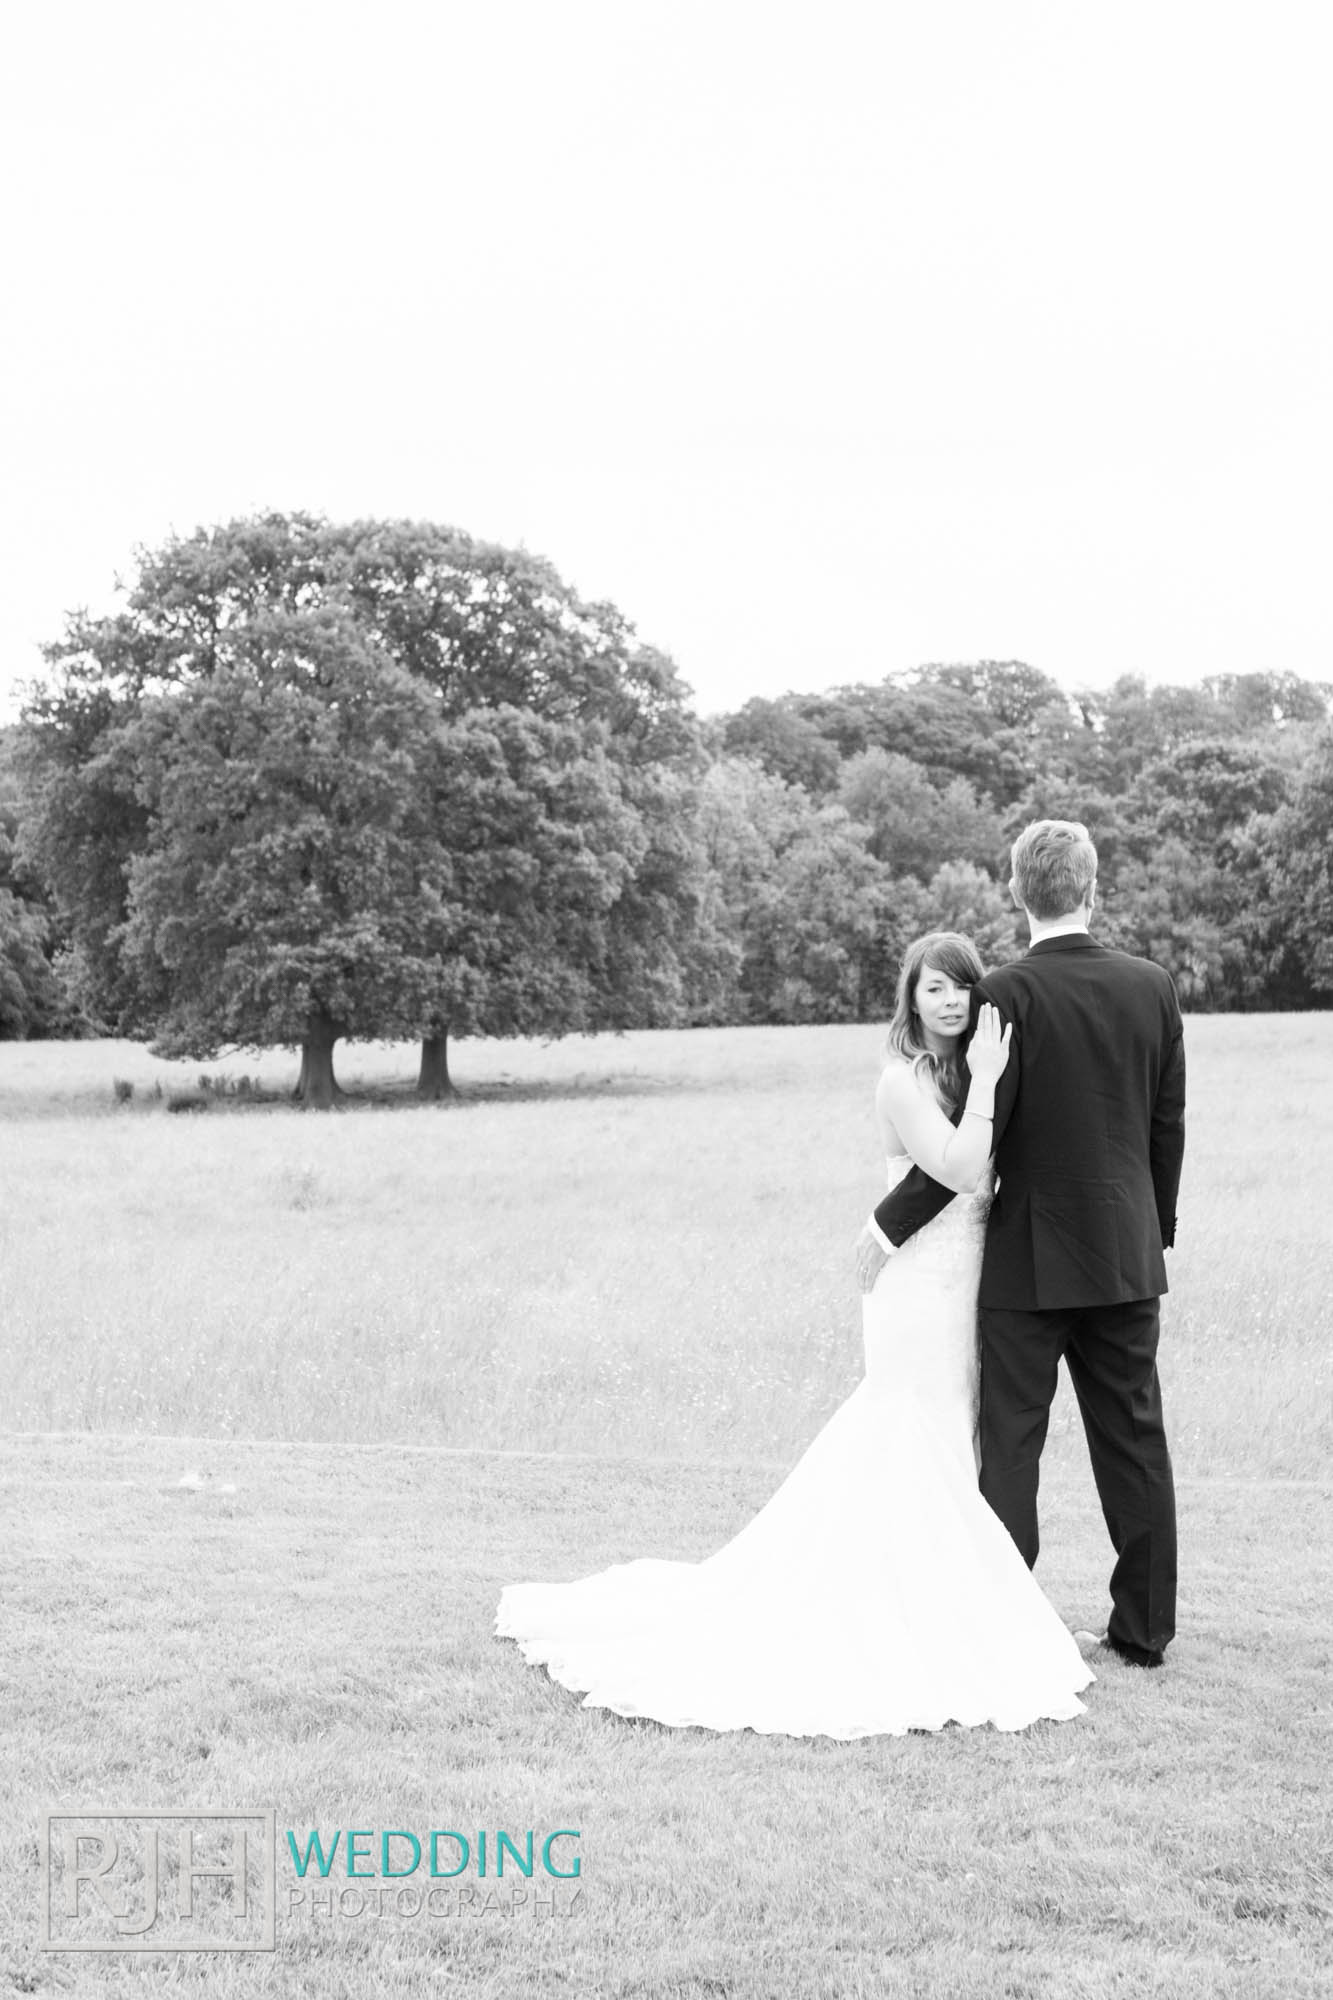 RJH Wedding Photography_2014 highlights_22.jpg